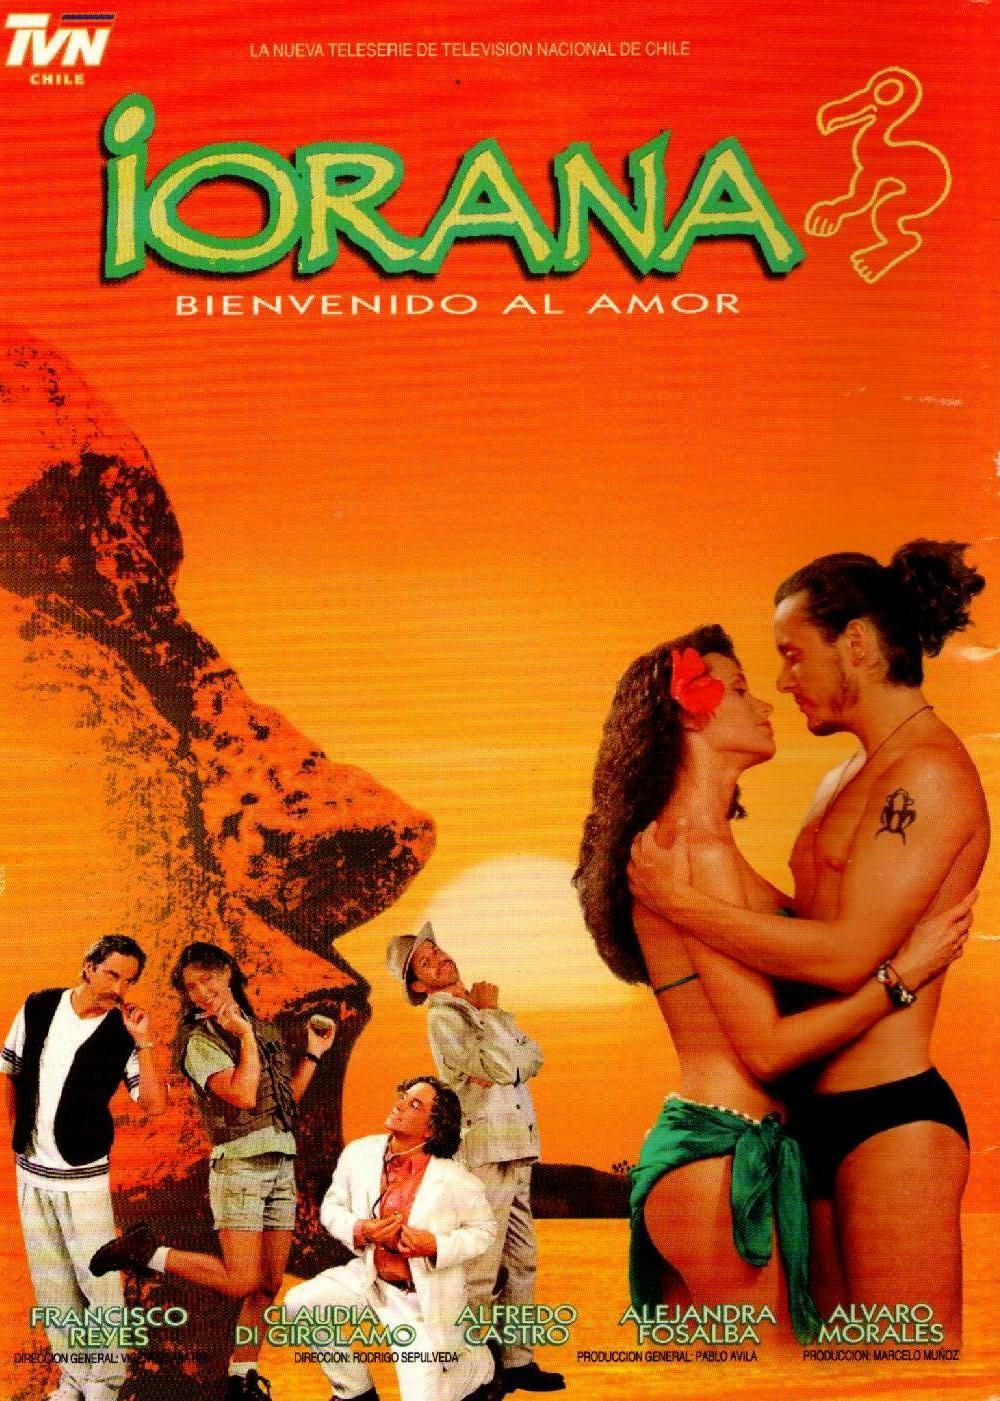 teleserie iorana